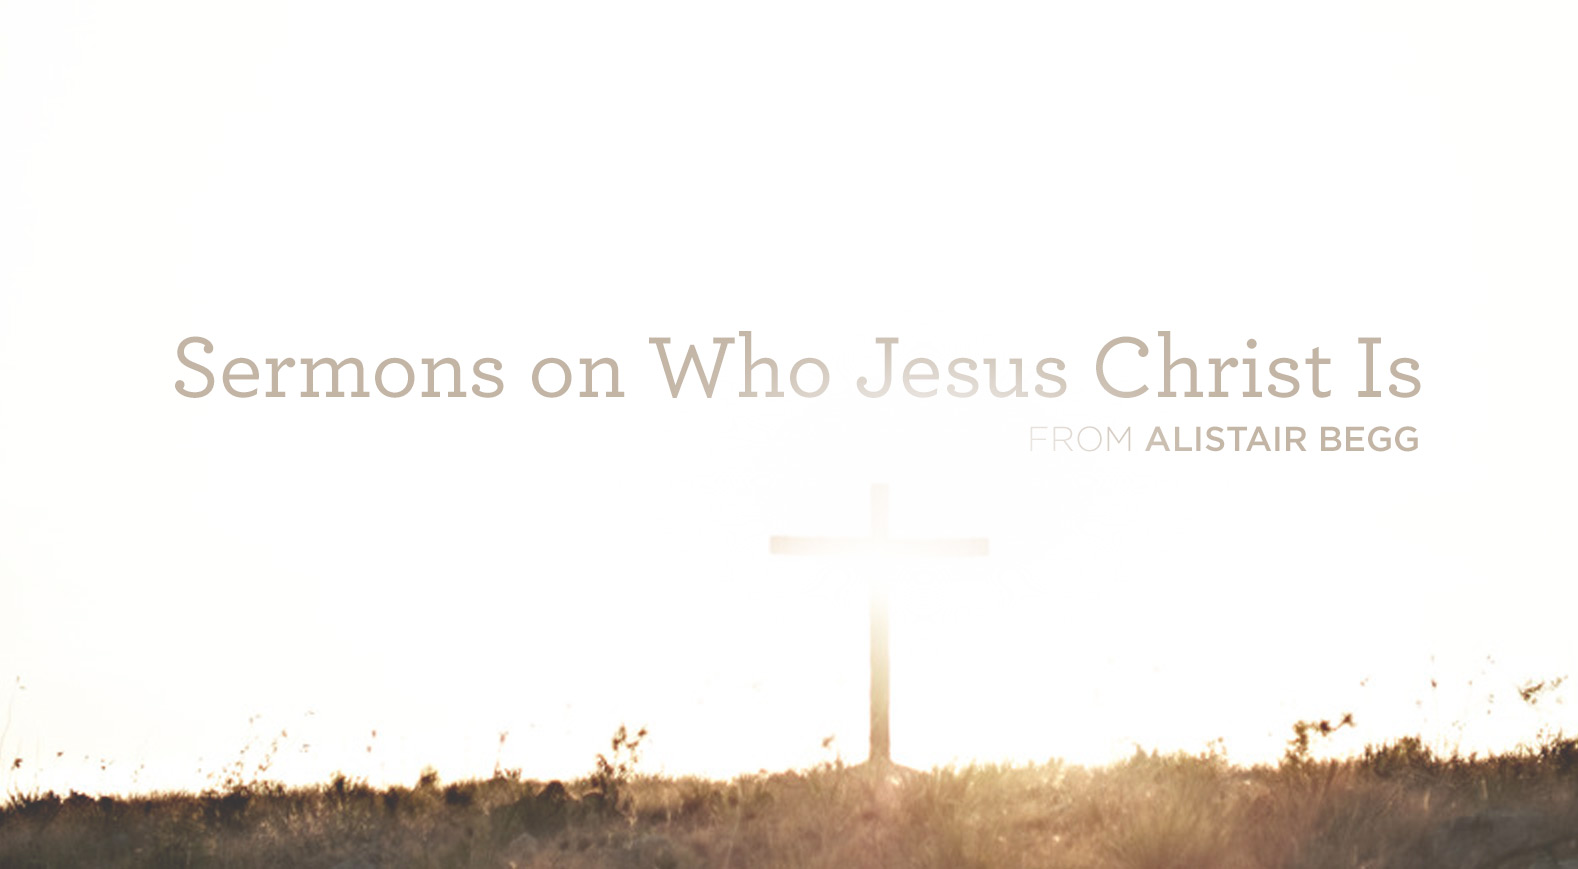 Sermons about Jesus Christ